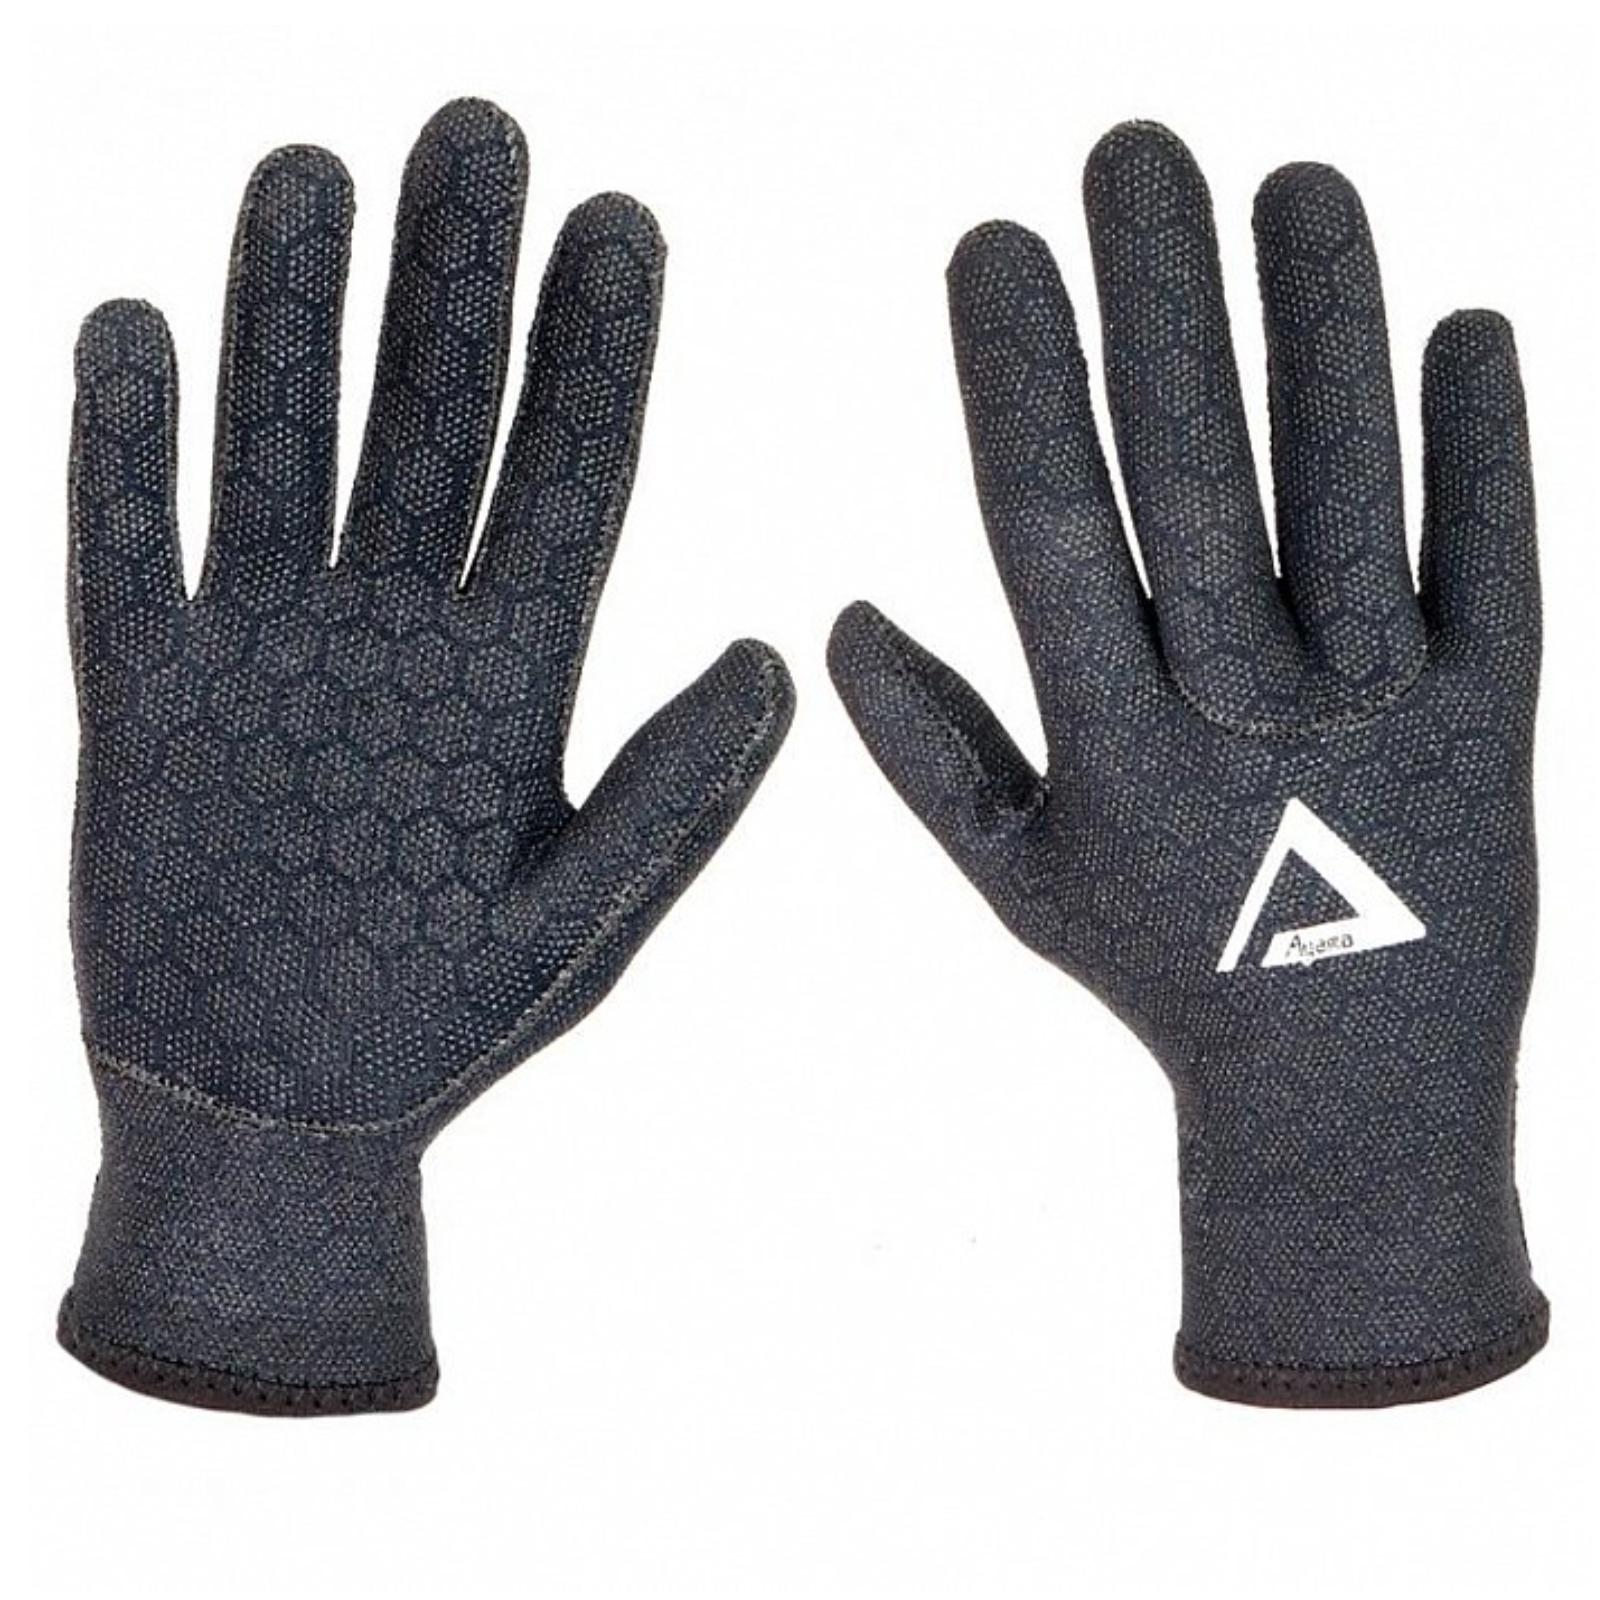 Neoprenové rukavice AGAMA Superstretch 3 mm - vel. L